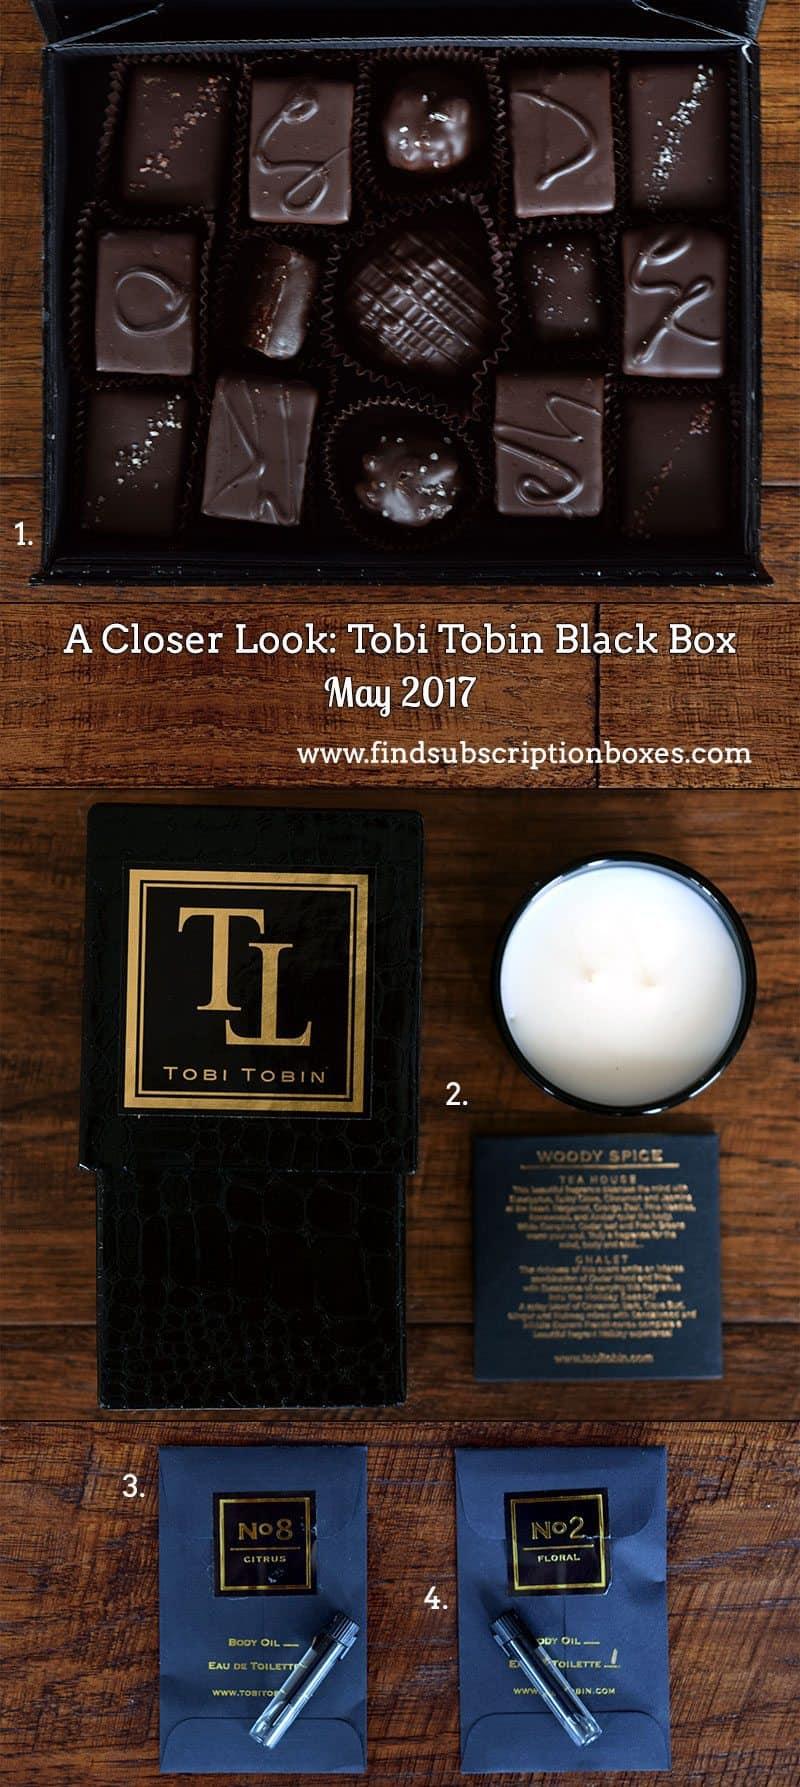 May 2017 Tobi Tobin Black Box Review - Inside the Box